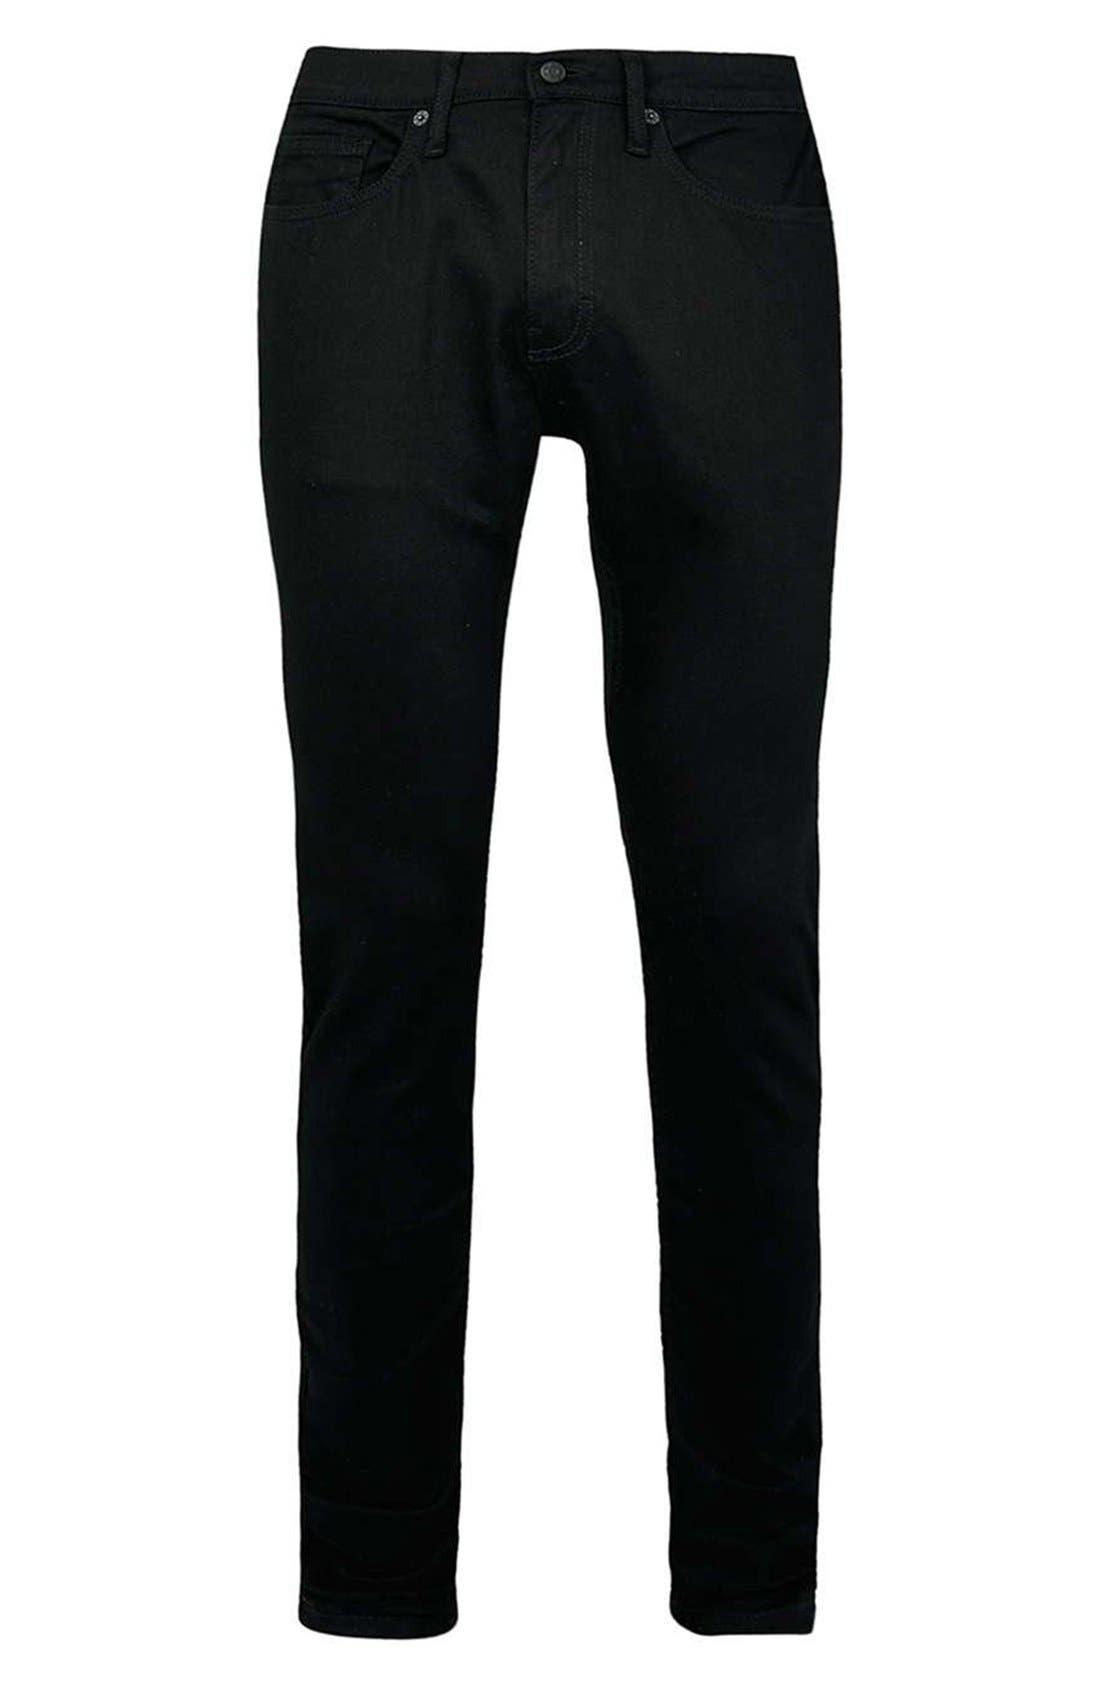 Skinny Stretch Jeans,                             Alternate thumbnail 9, color,                             BLACK